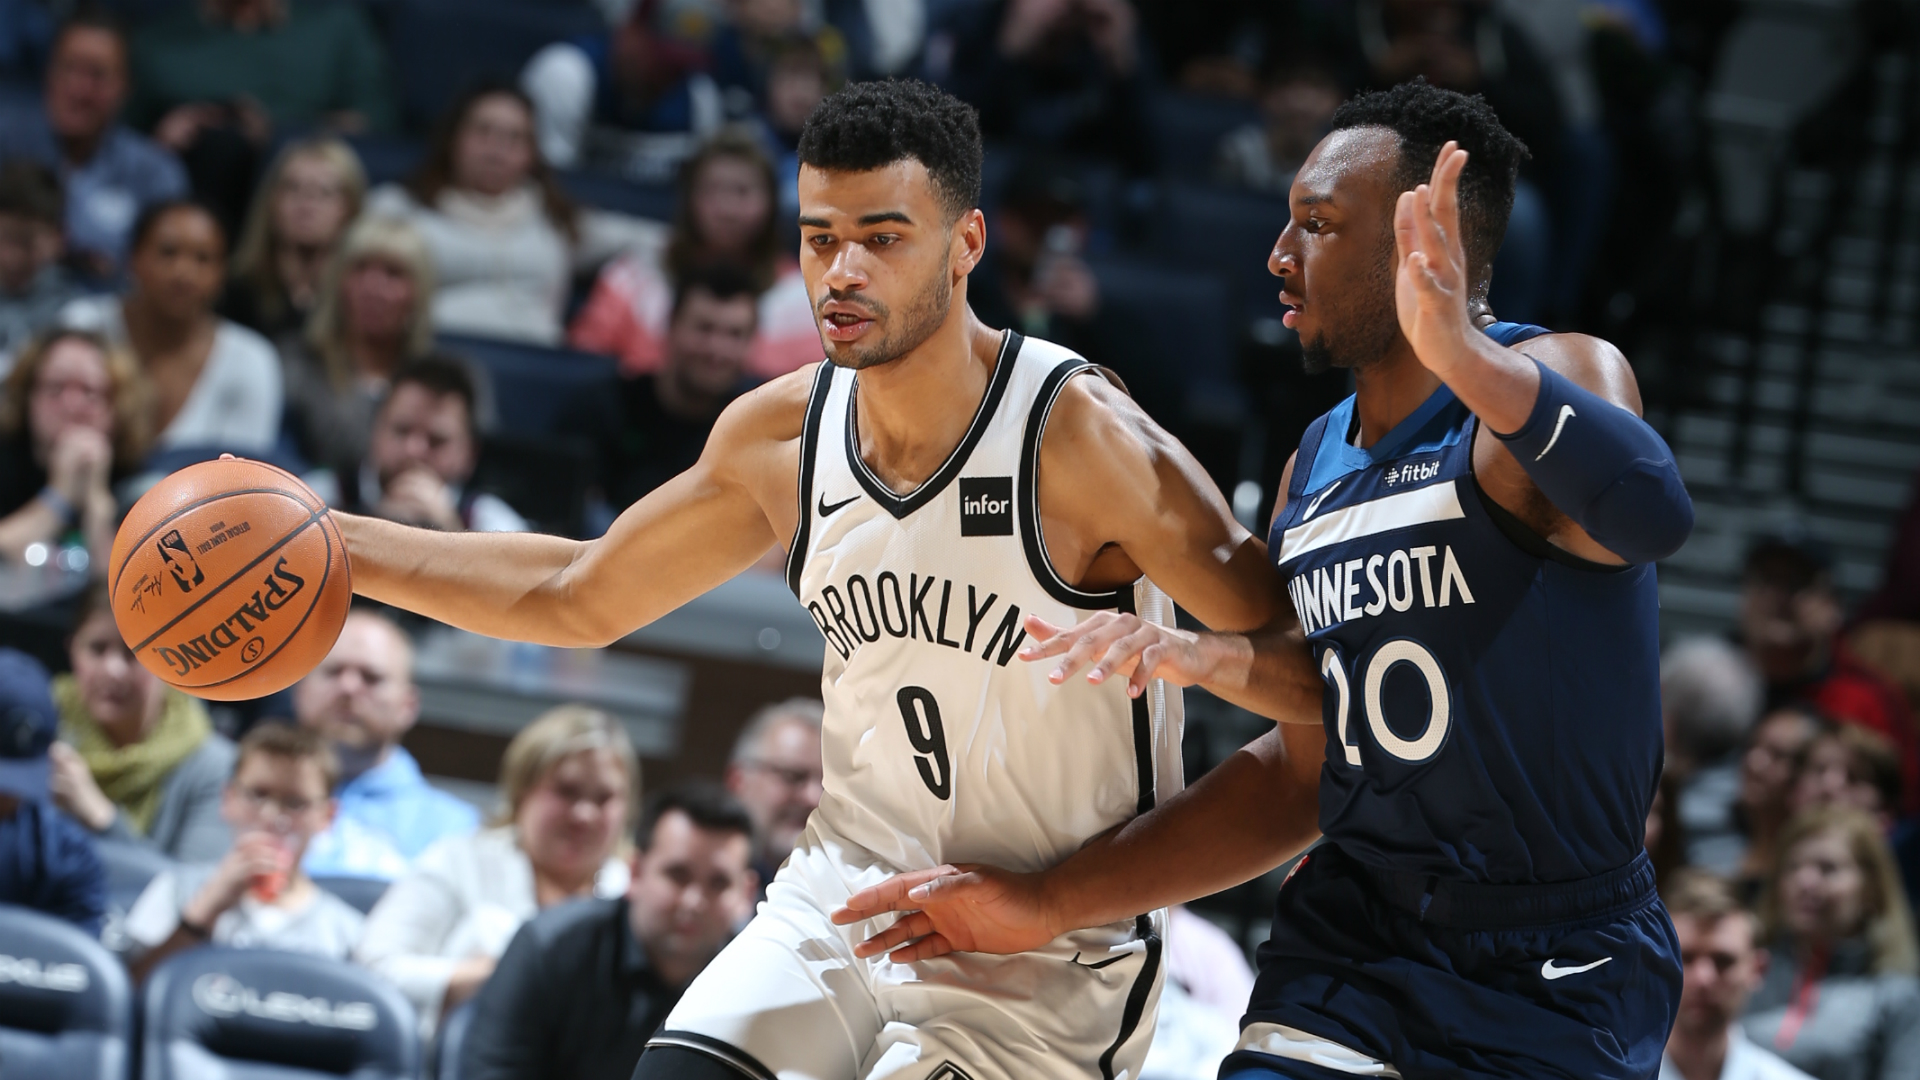 Nets @ Timberwolves